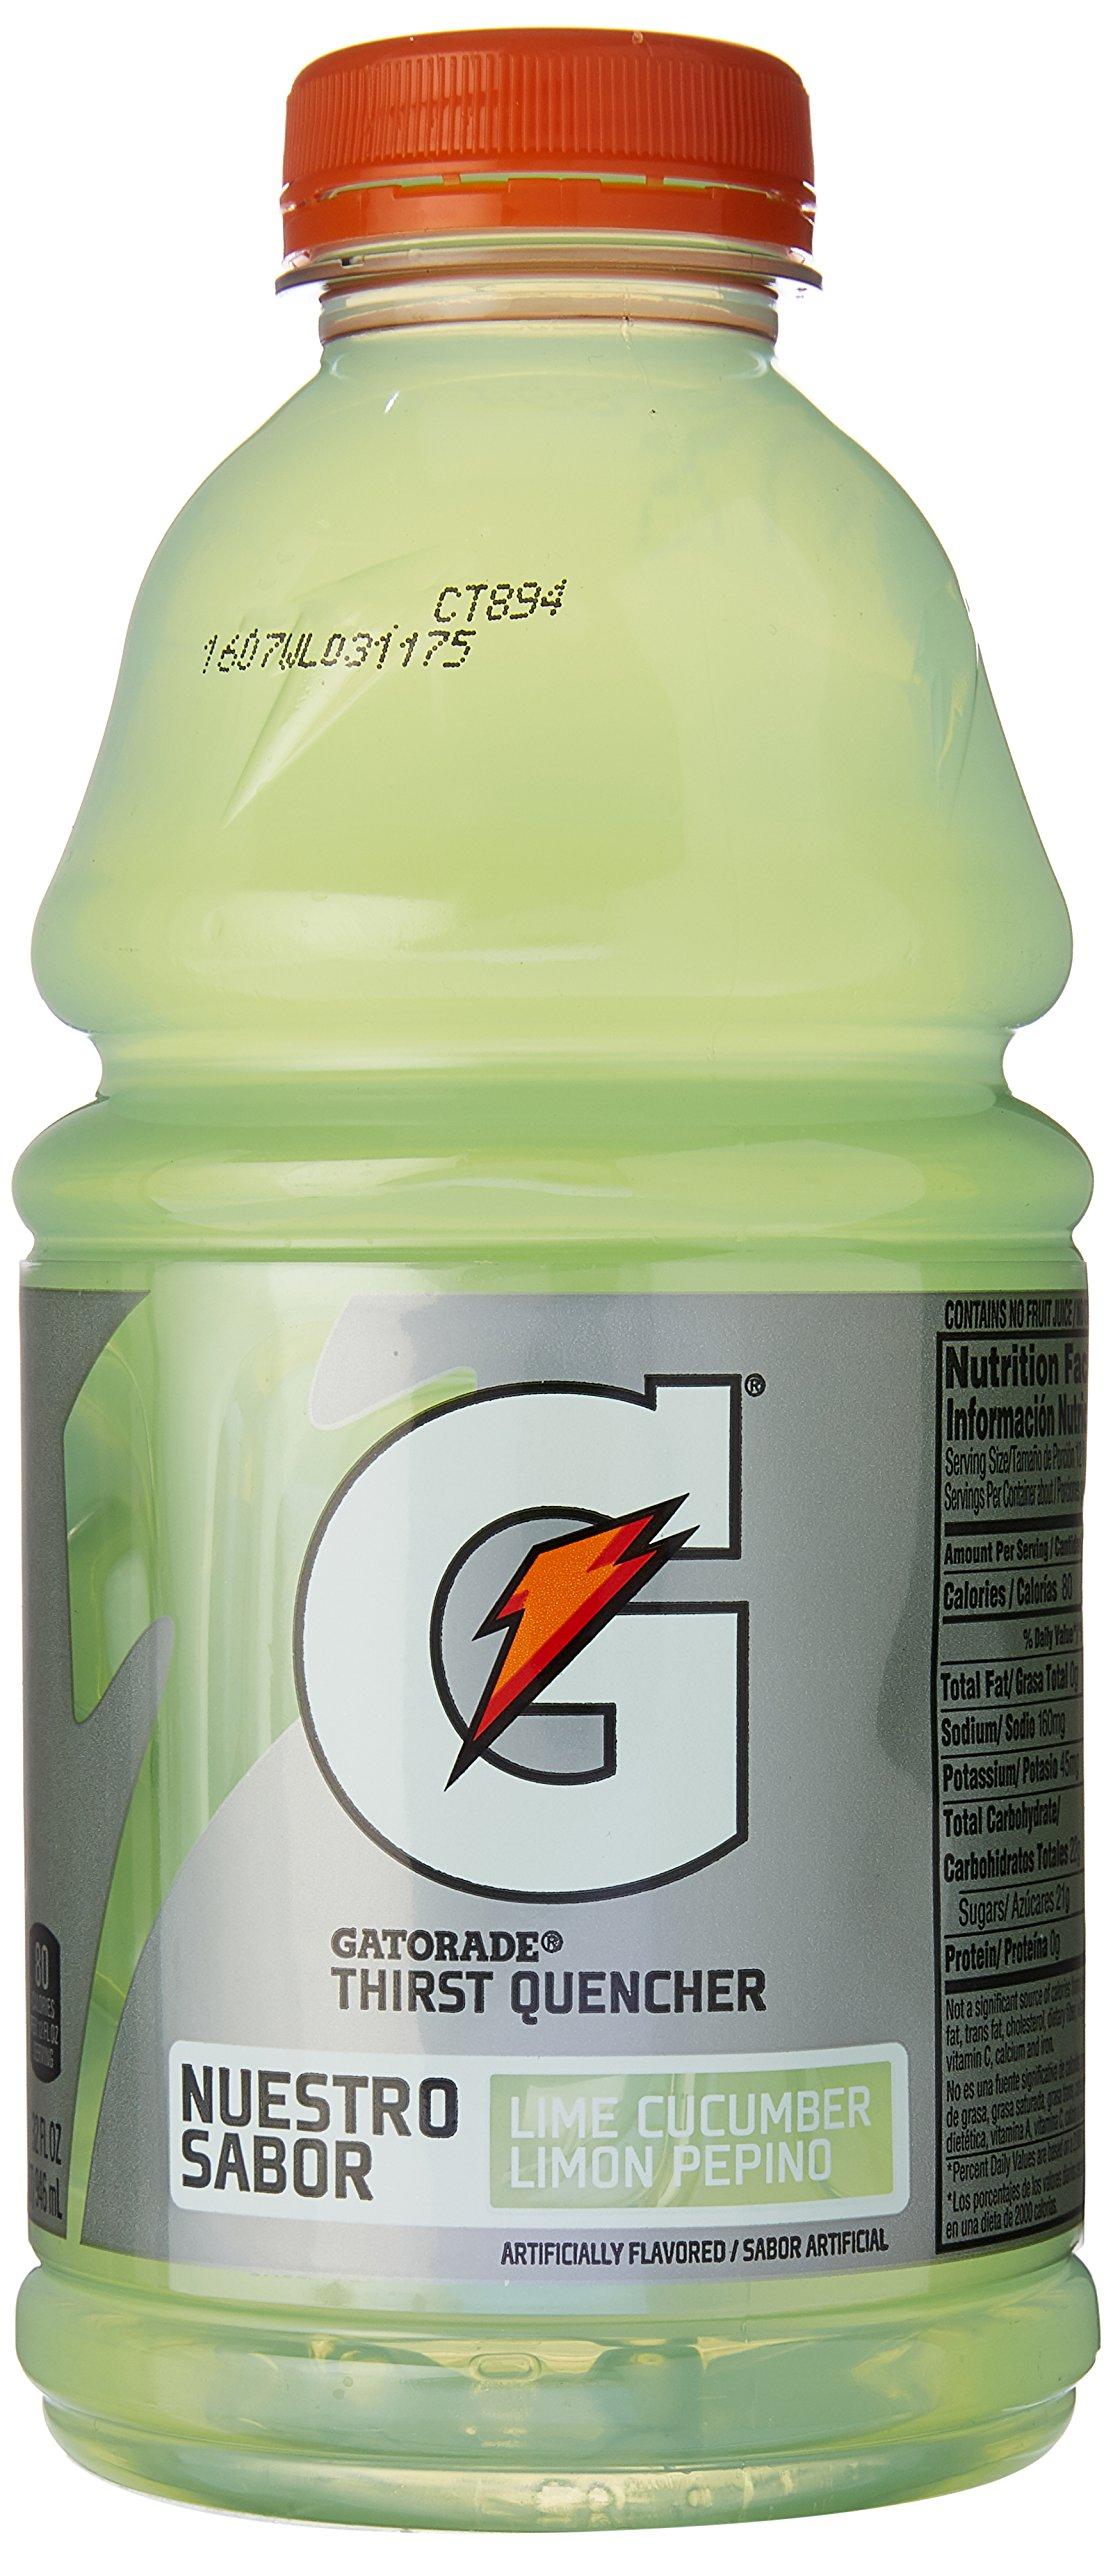 Gatorade G Series Perform Lime Cucumber Sports Drink, 32 oz